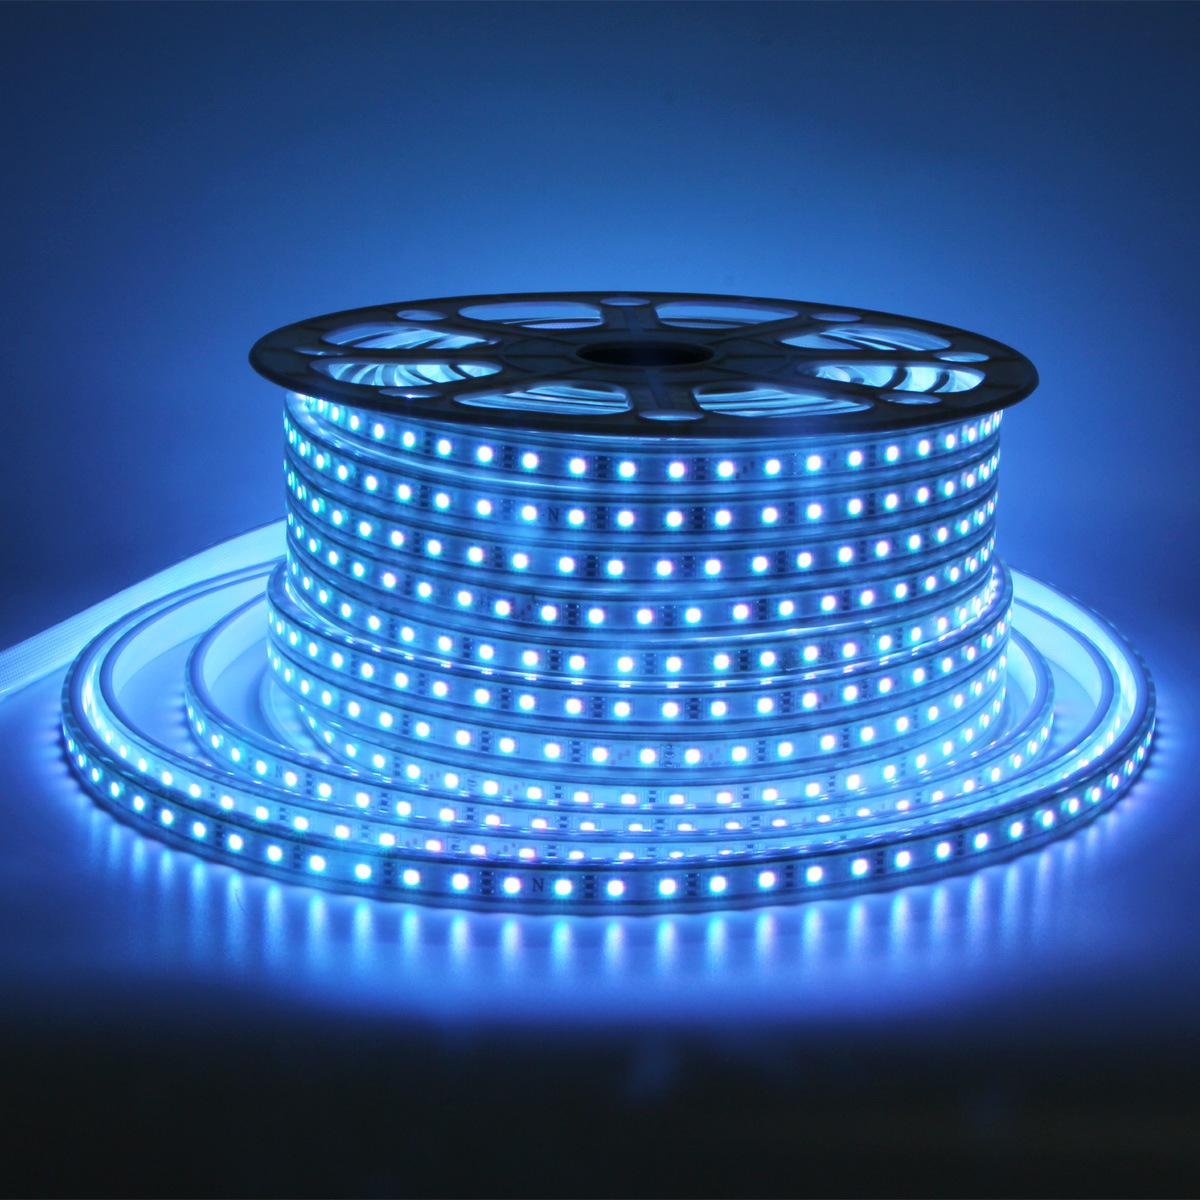 Image of: China Rgb Led Strip Lights 5050 Ac220v Ac110v 50m 100m Multicolor Flexible Roll Ip65 Outdoor Waterproof Rgb Multicolor Led Light Strips China Car Led Rgb Led Strip